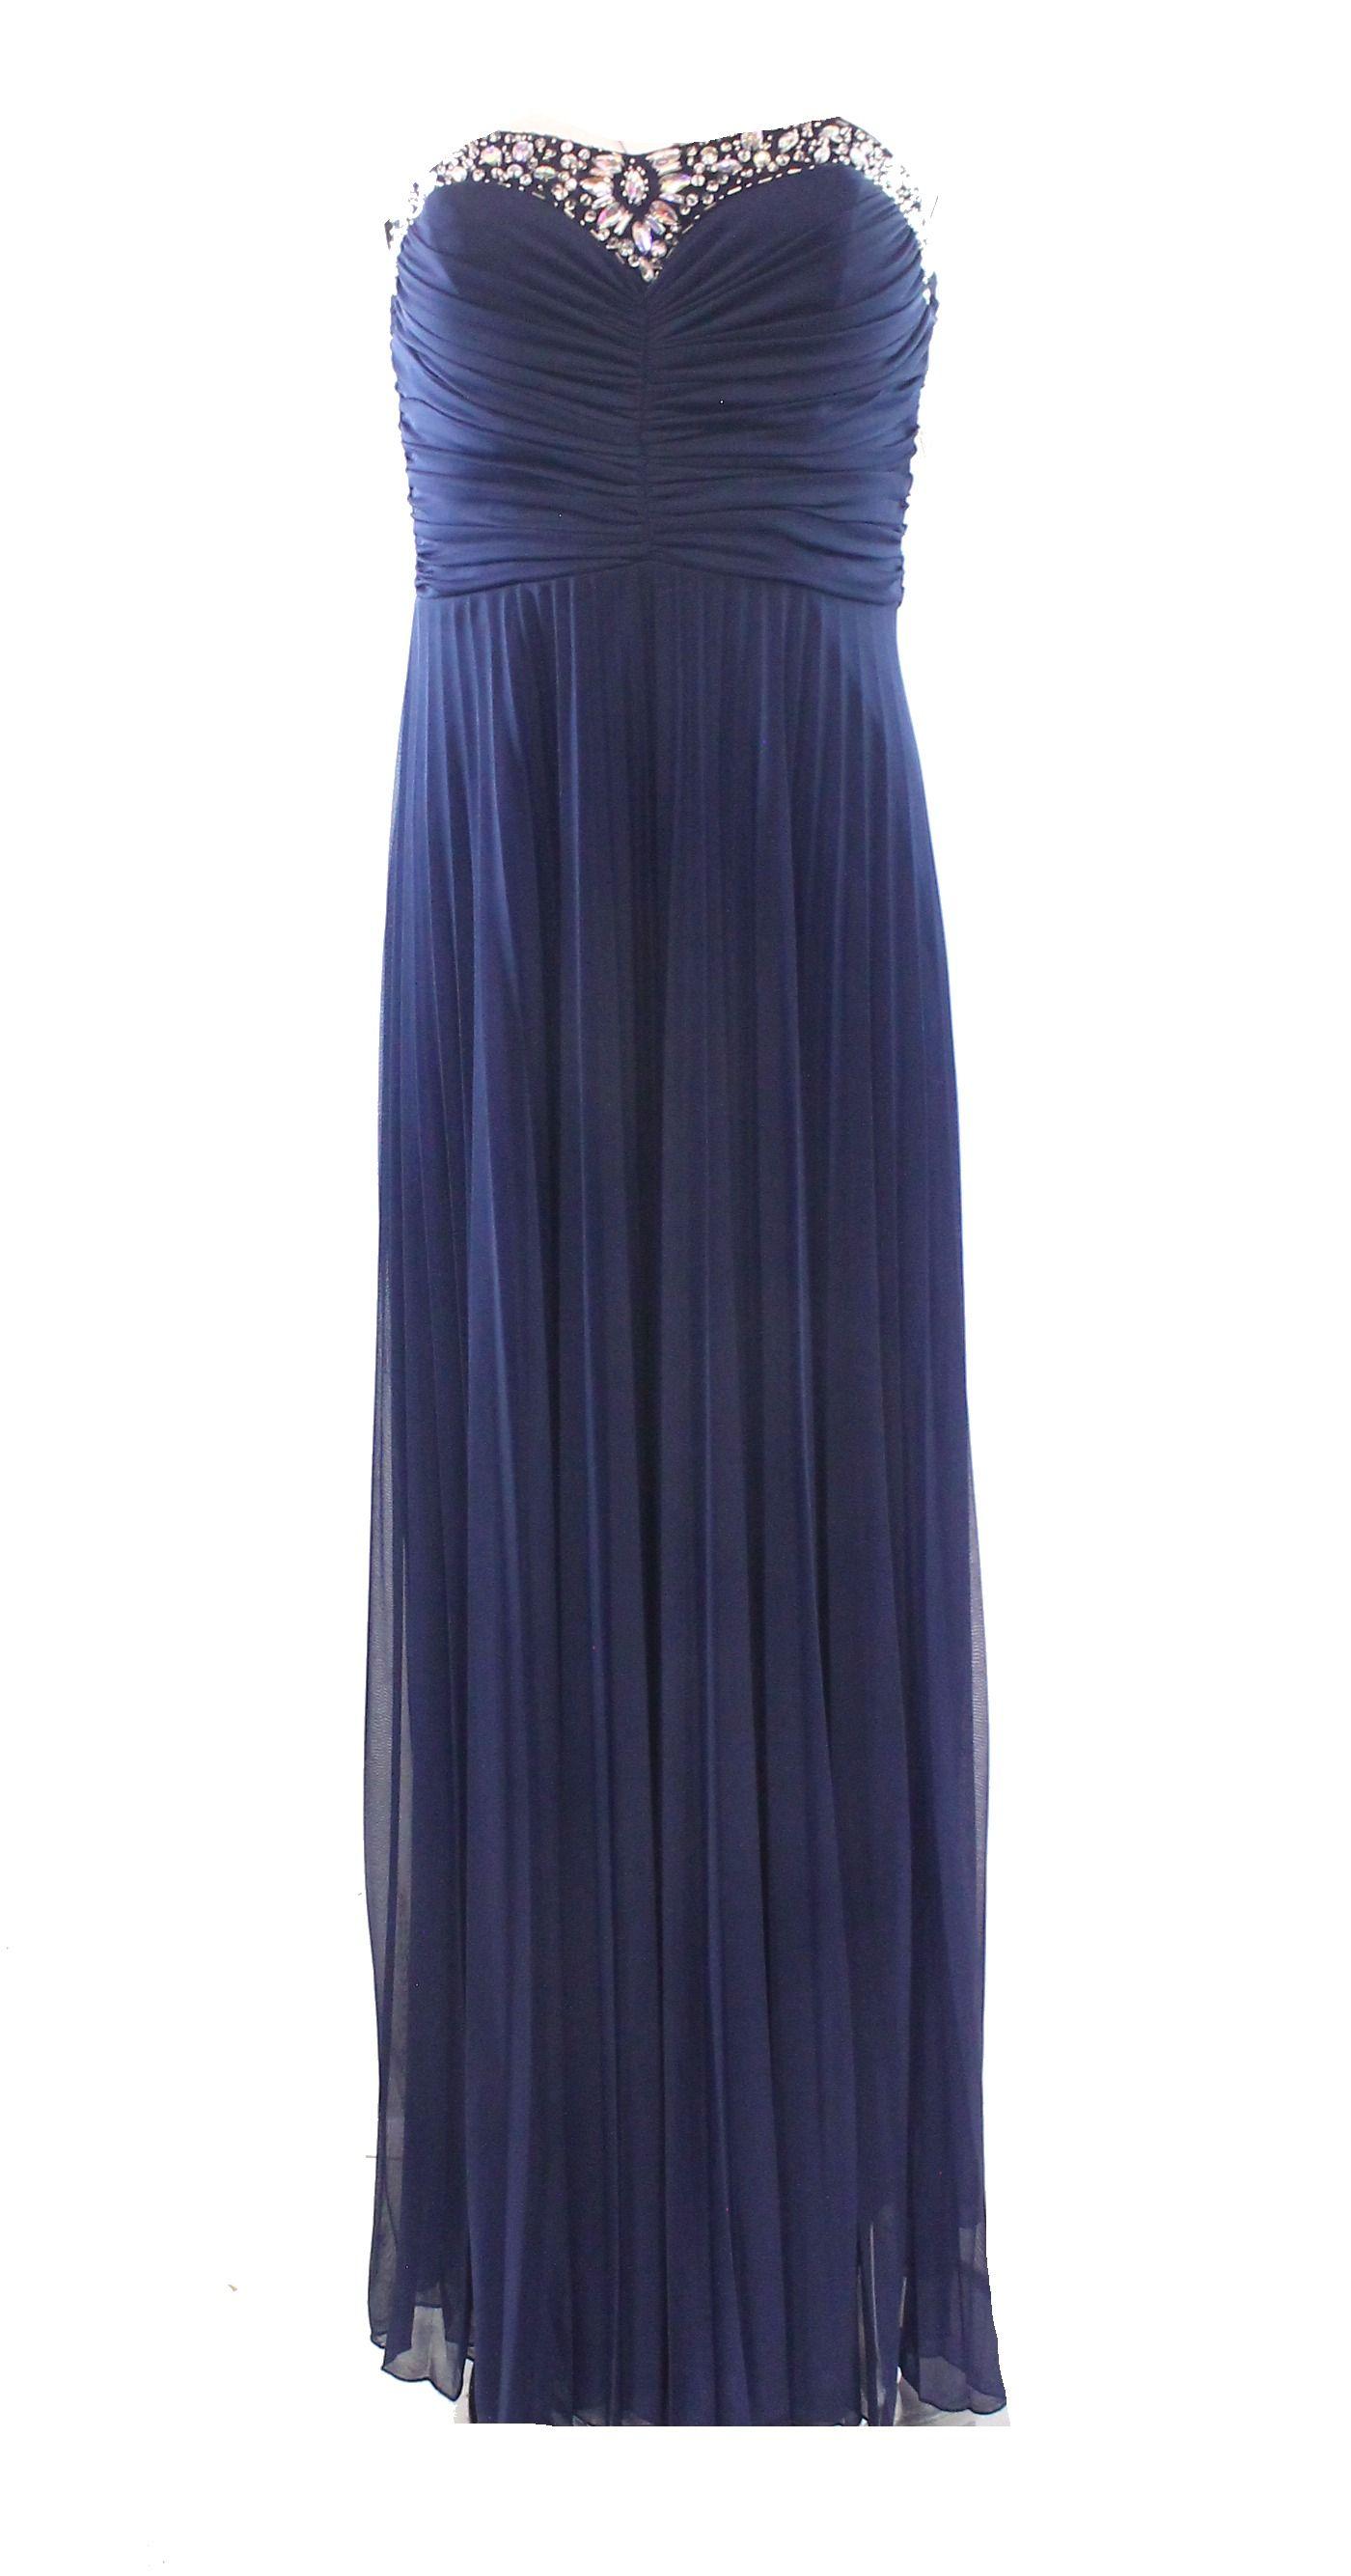 B. Darlin NEW Blue Navy Embellished Size 7/8 Junior Sheath Ruched Dress $99